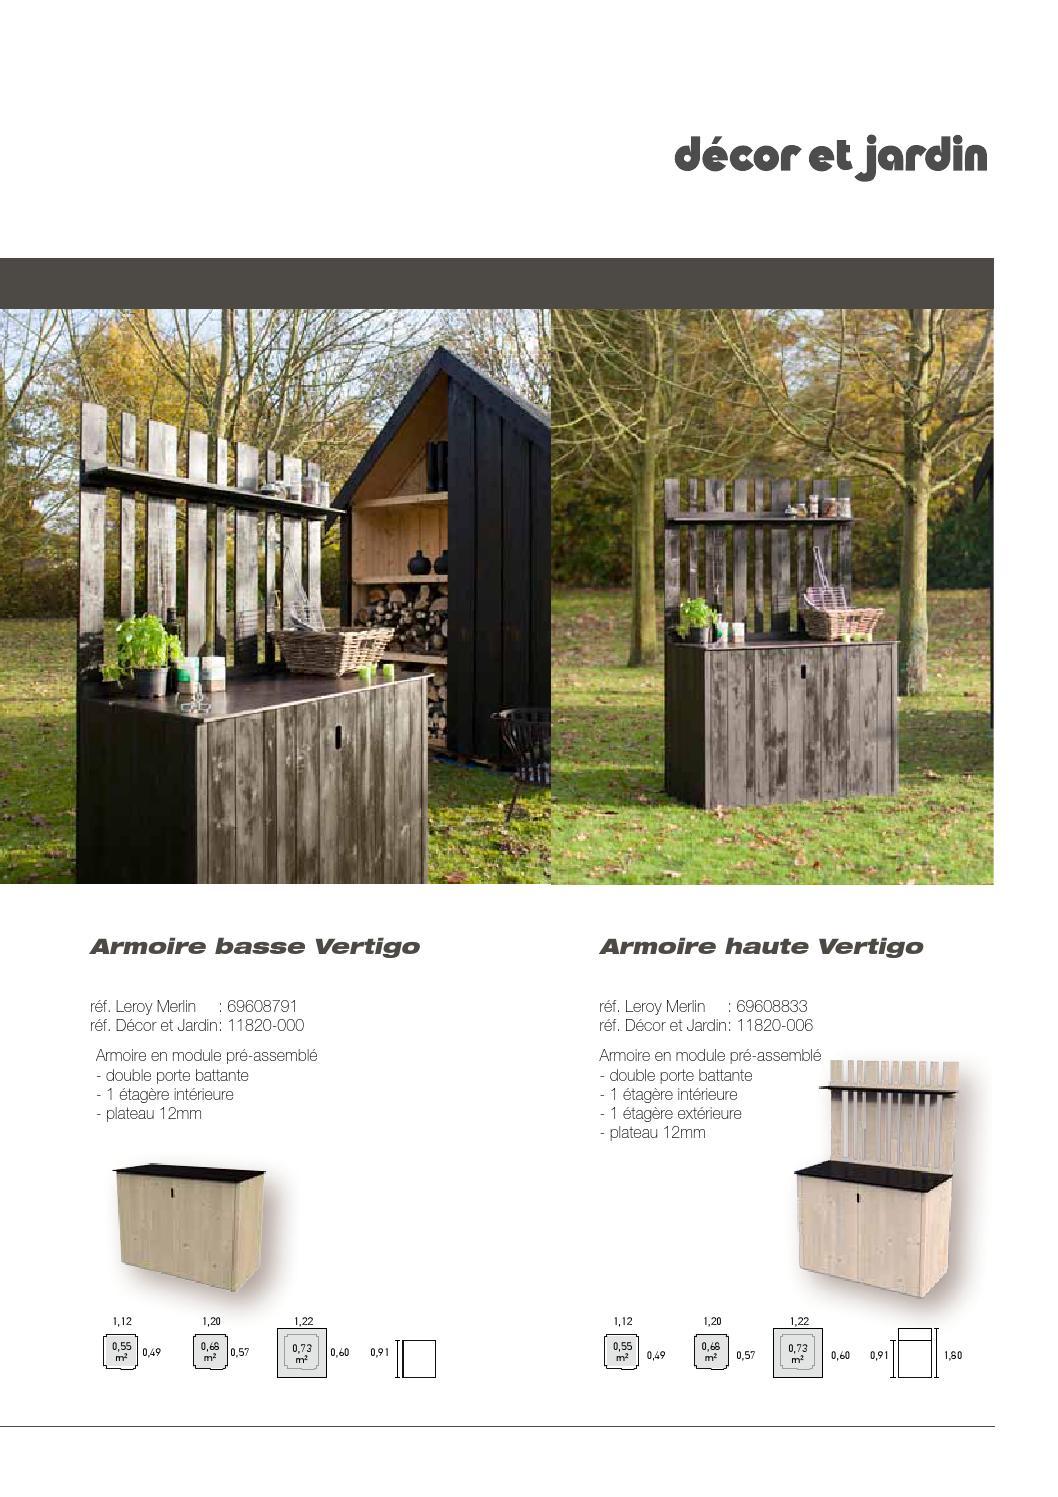 Décor Et Jardin Catalogue Leroy Merlin By Cras Woodgroup - Issuu encequiconcerne Armoire Jardin Leroy Merlin